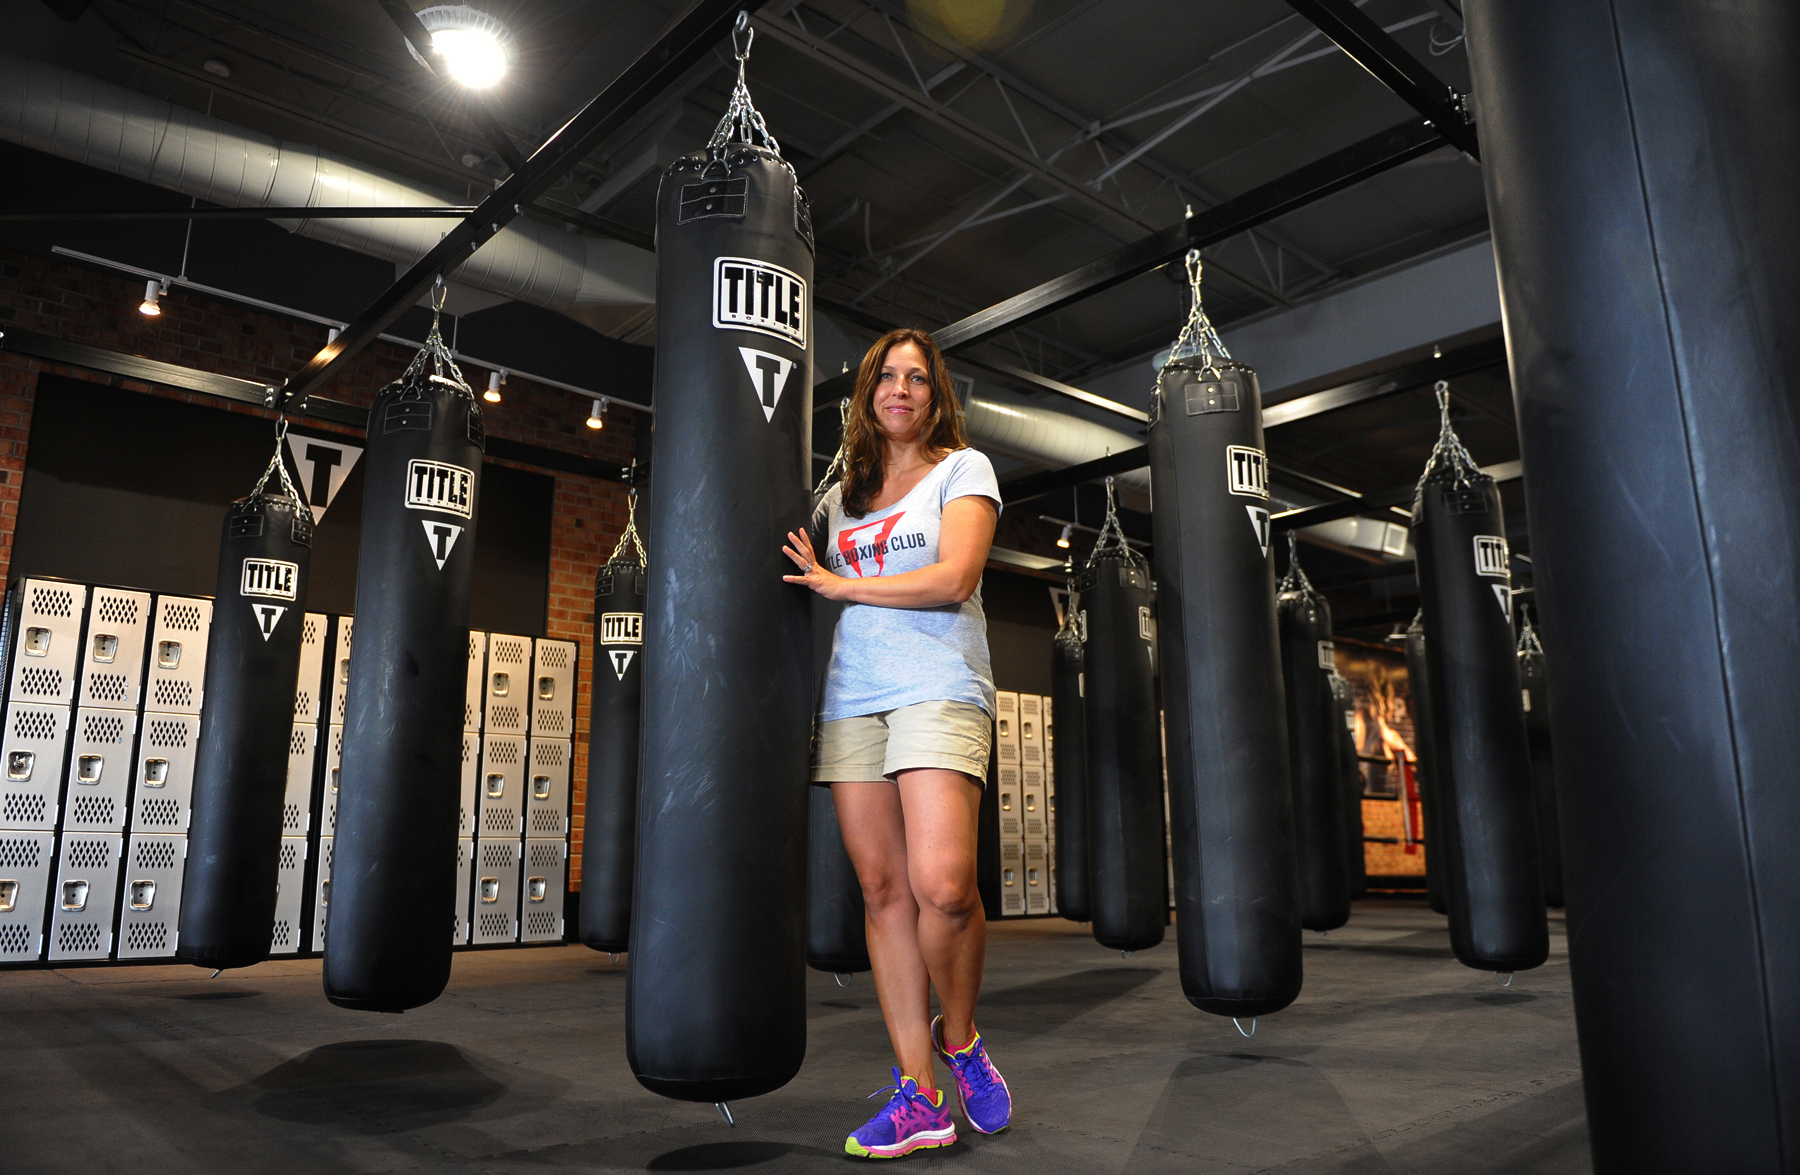 Florida gold coast amateur boxing association